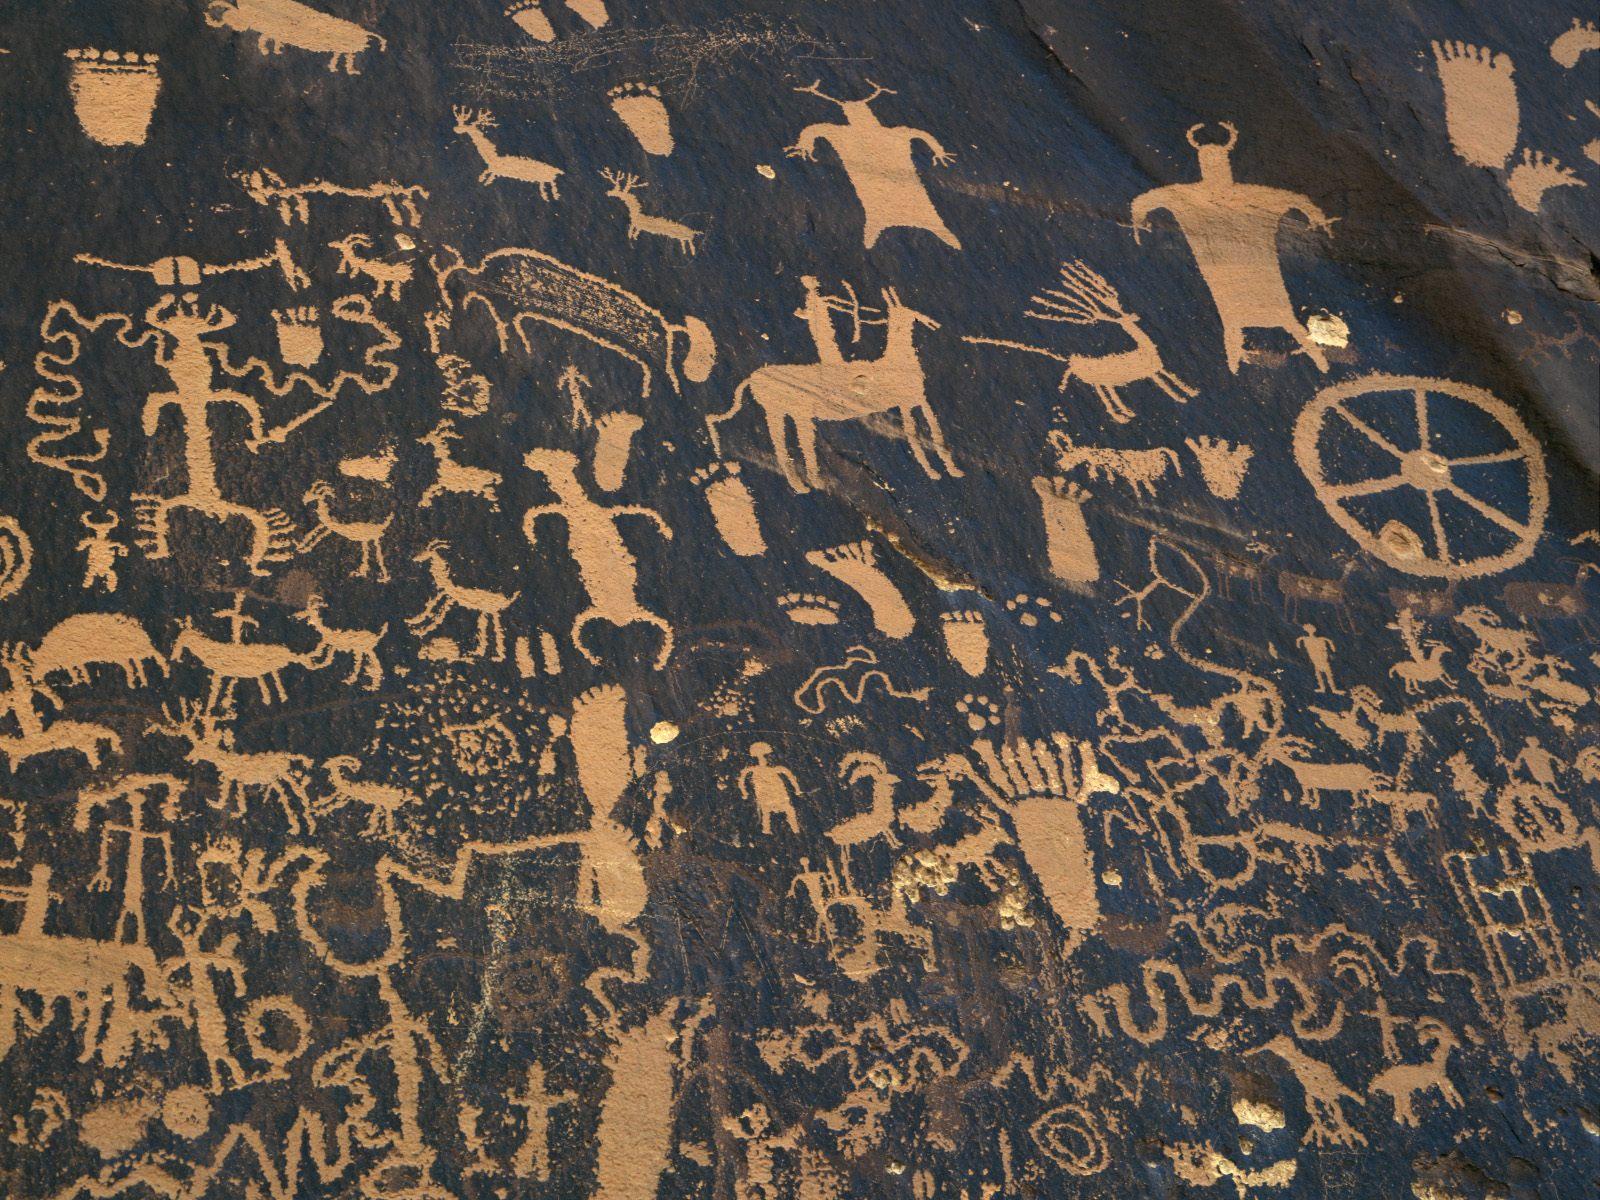 Classic Man Cave Art : Newspaper rock state historic park utah picture